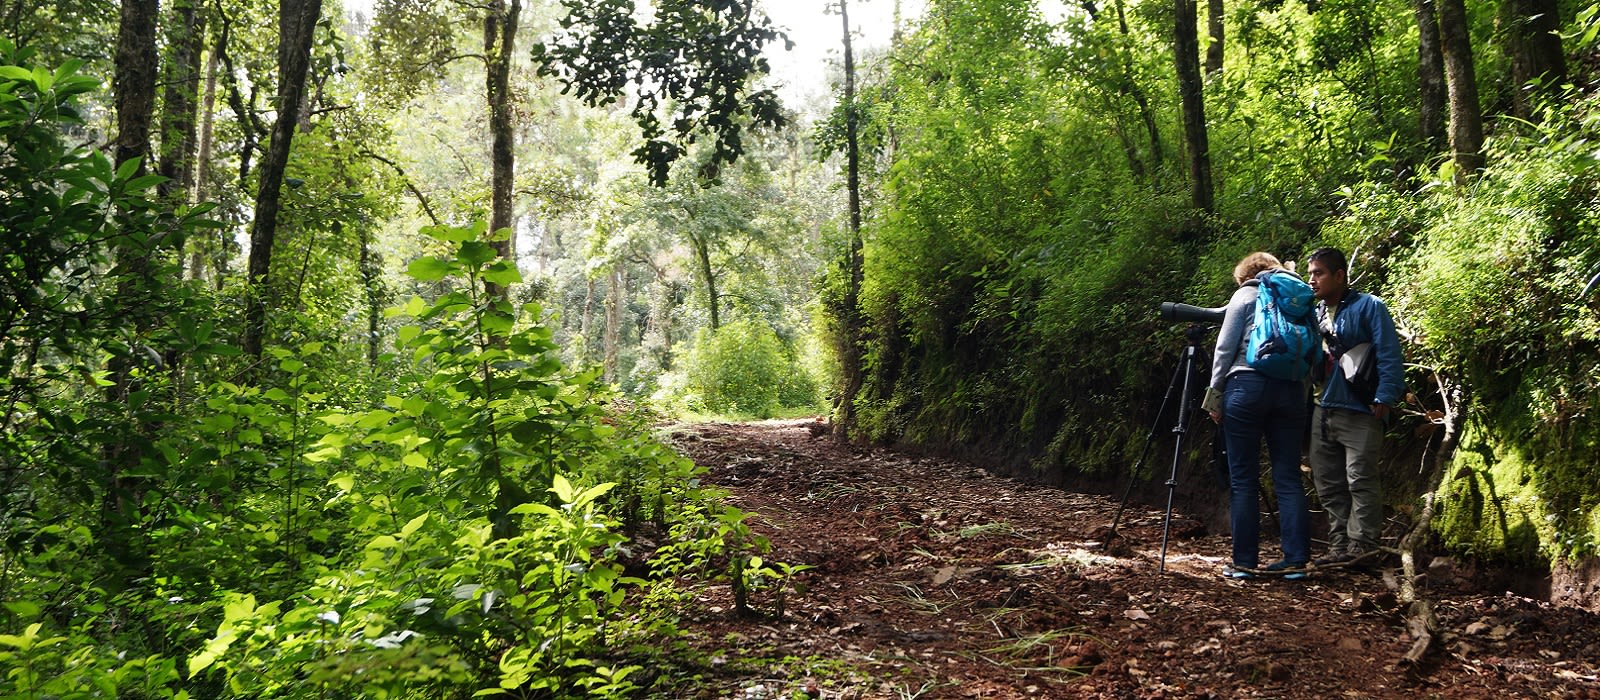 Exotische Vögel & Bezaubernde Landschaften – Vogelbeobachtung in Guatemala Urlaub 2